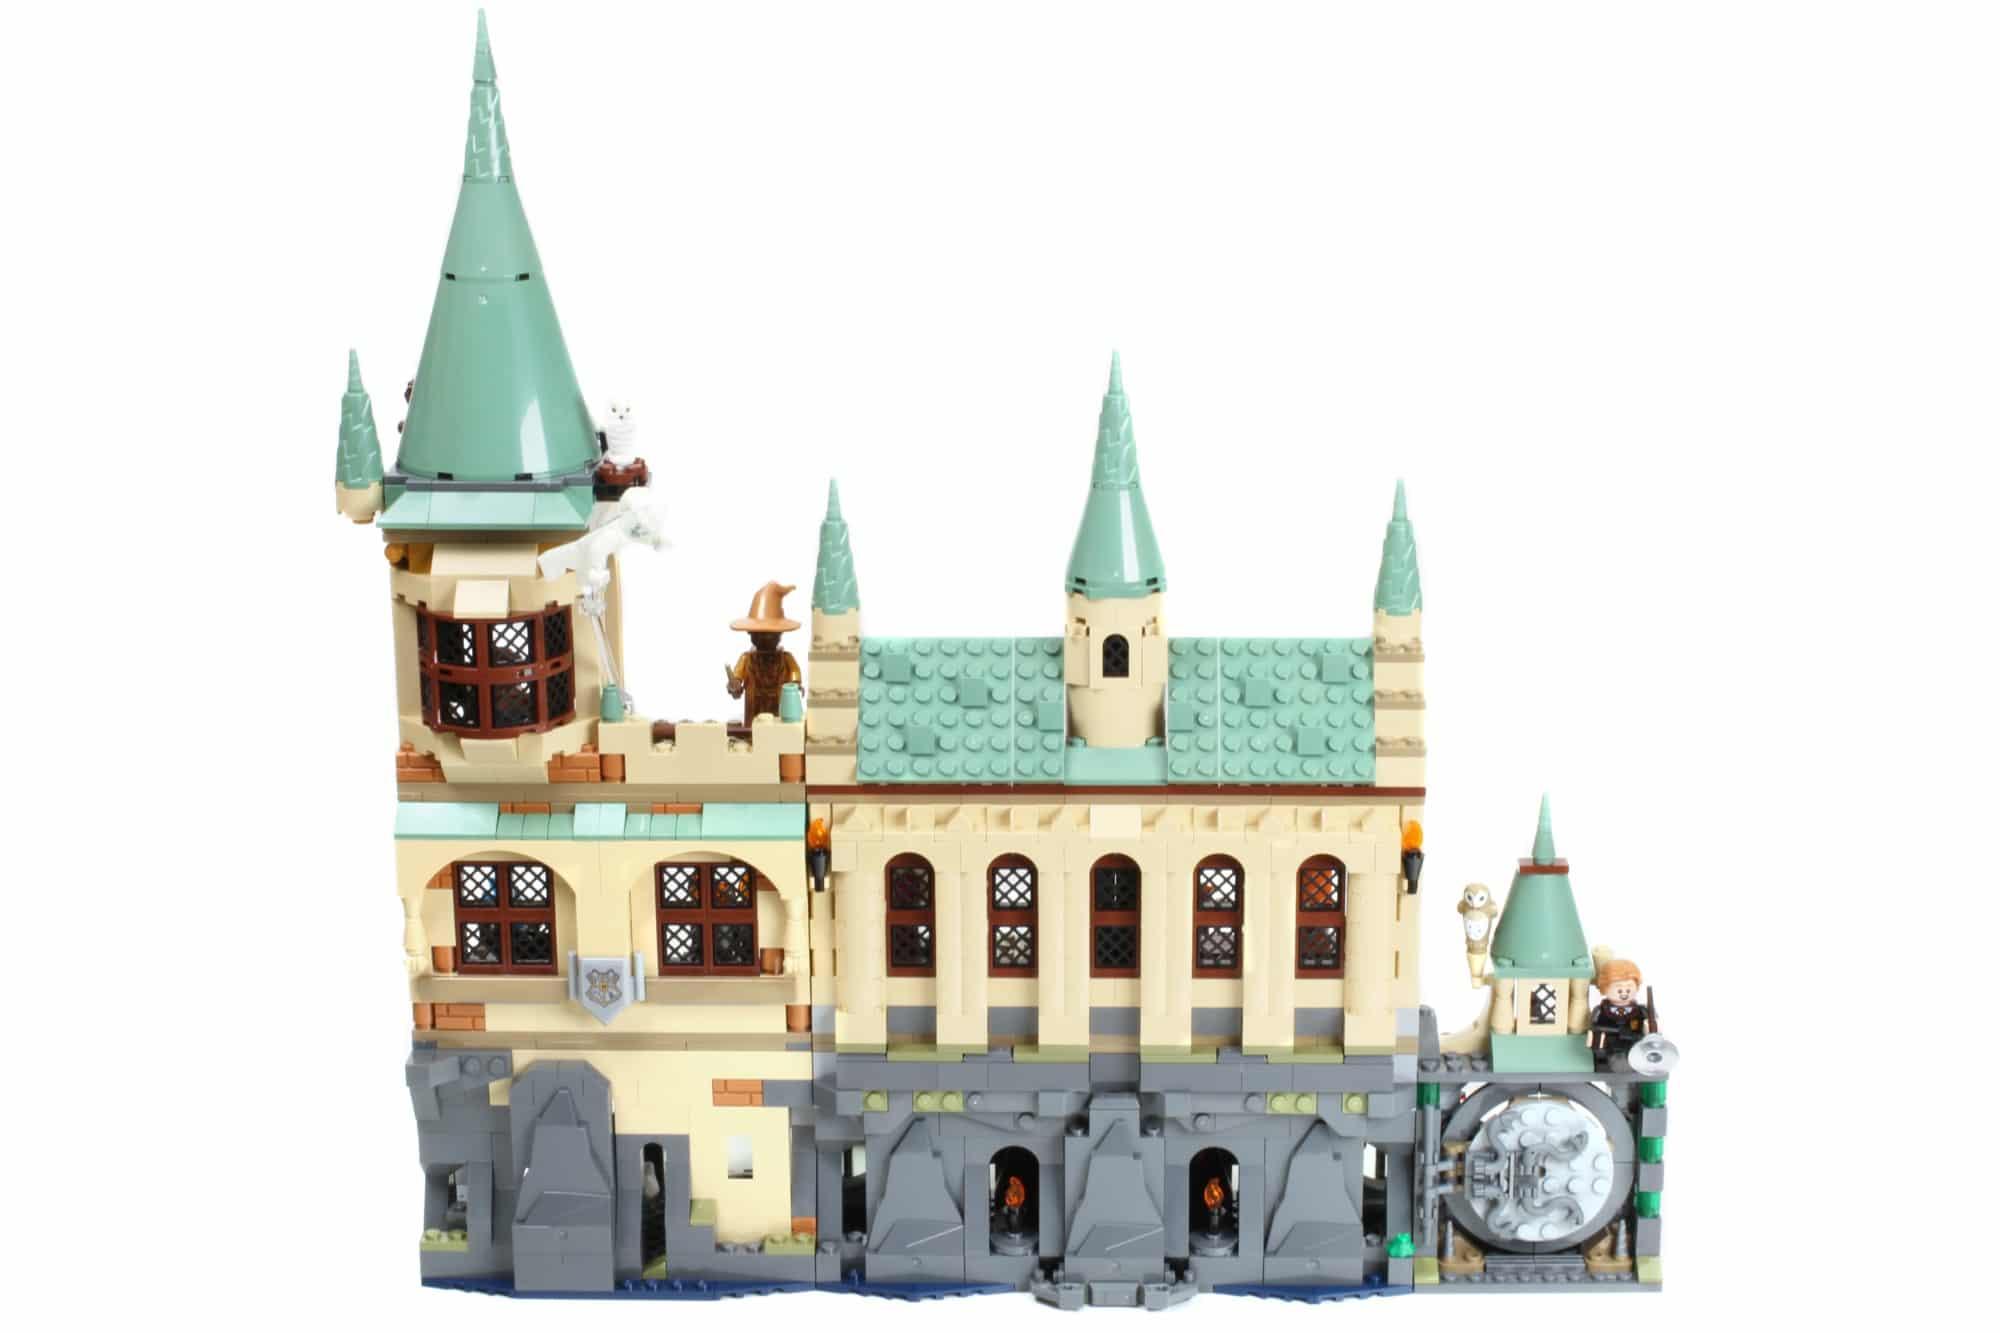 LEGO Harry Potter 76389 Hogwarts Kammer Des Schreckens Schritt 9 14